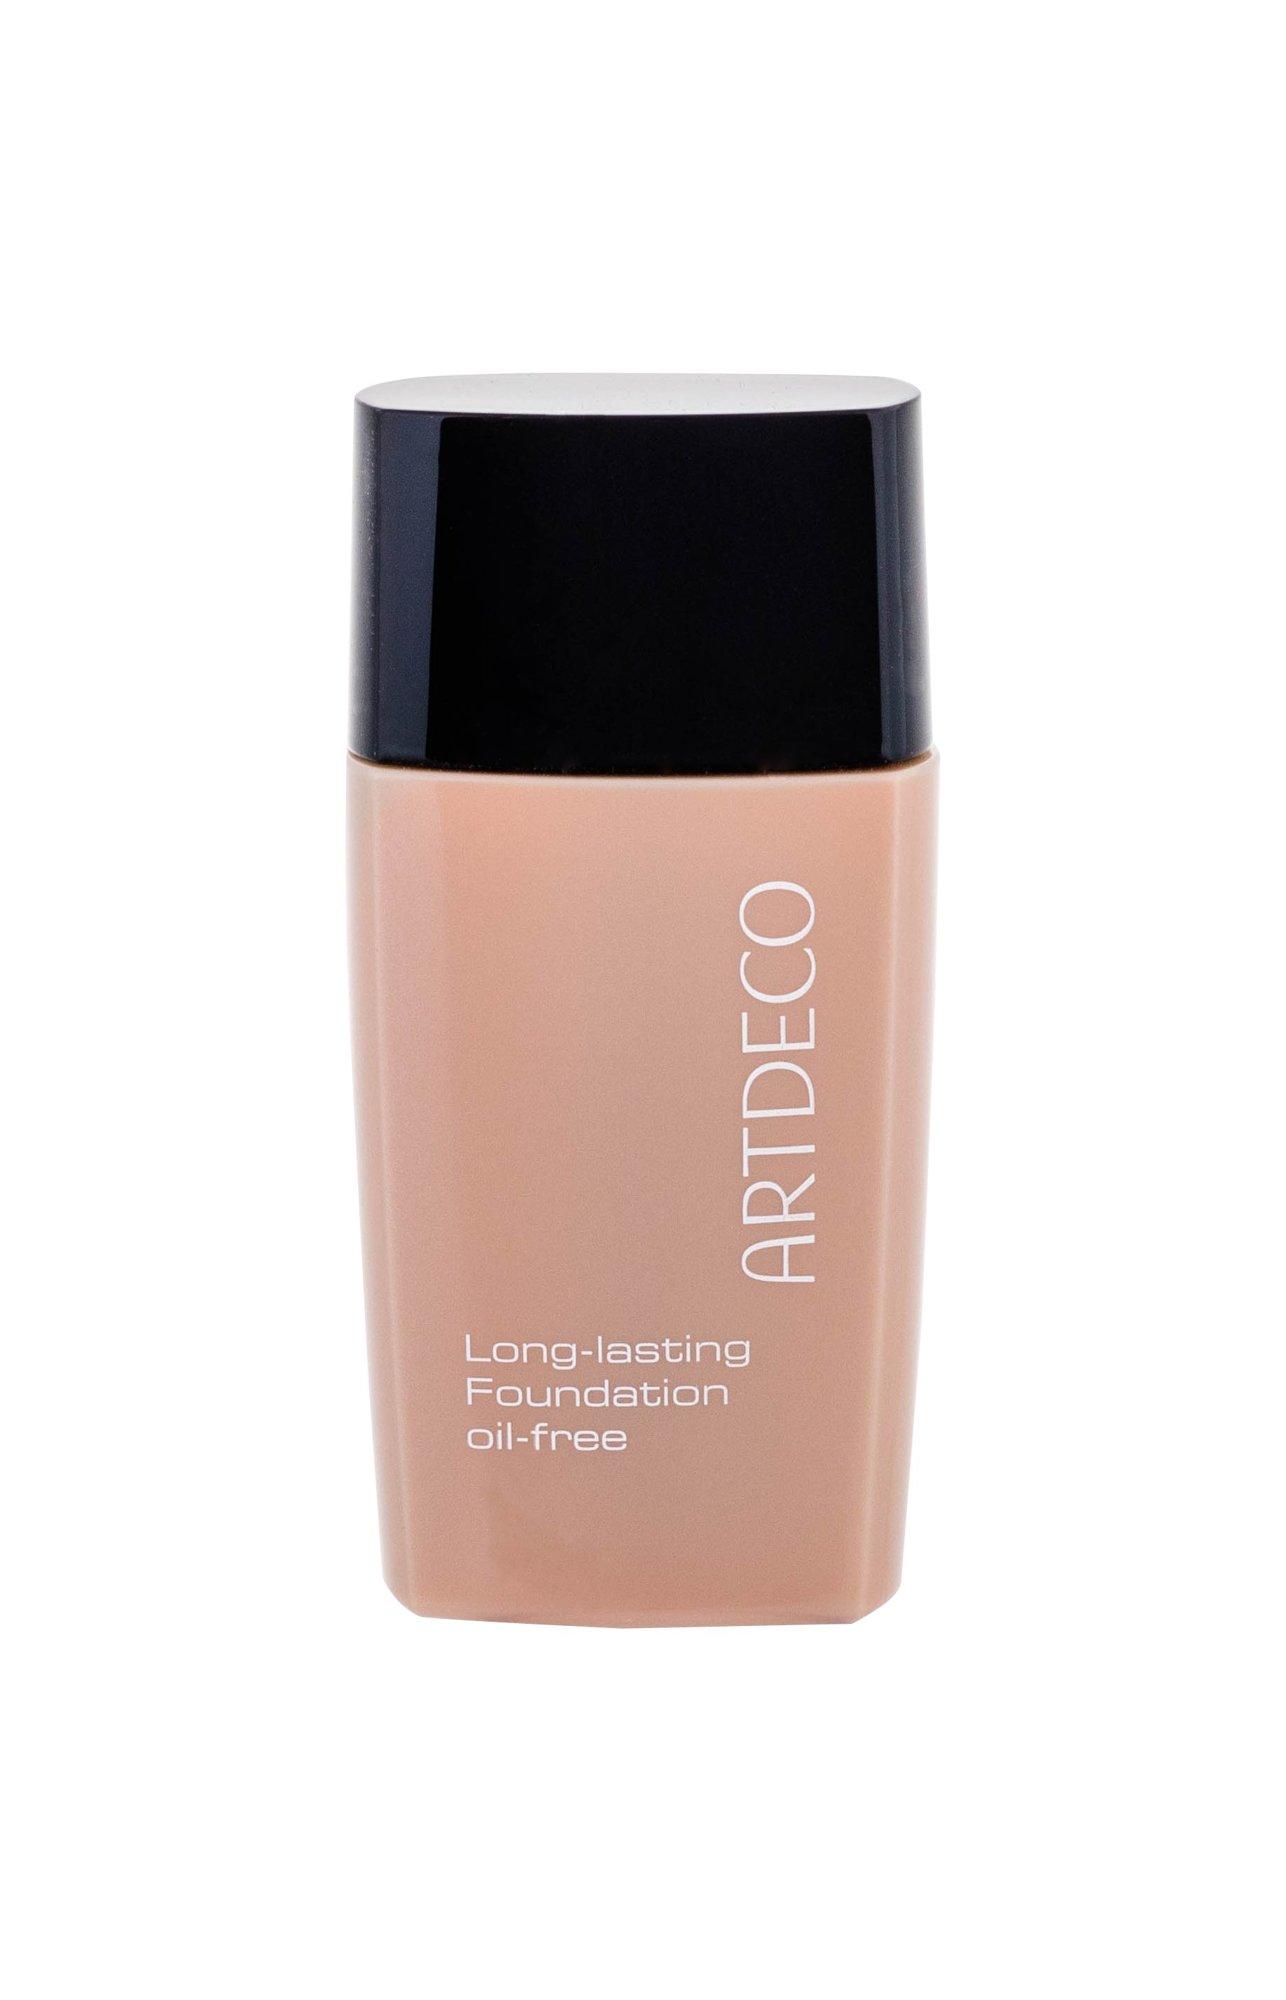 Artdeco Long Lasting Foundation Oil-Free Makeup 30ml 05 Fresh Beige